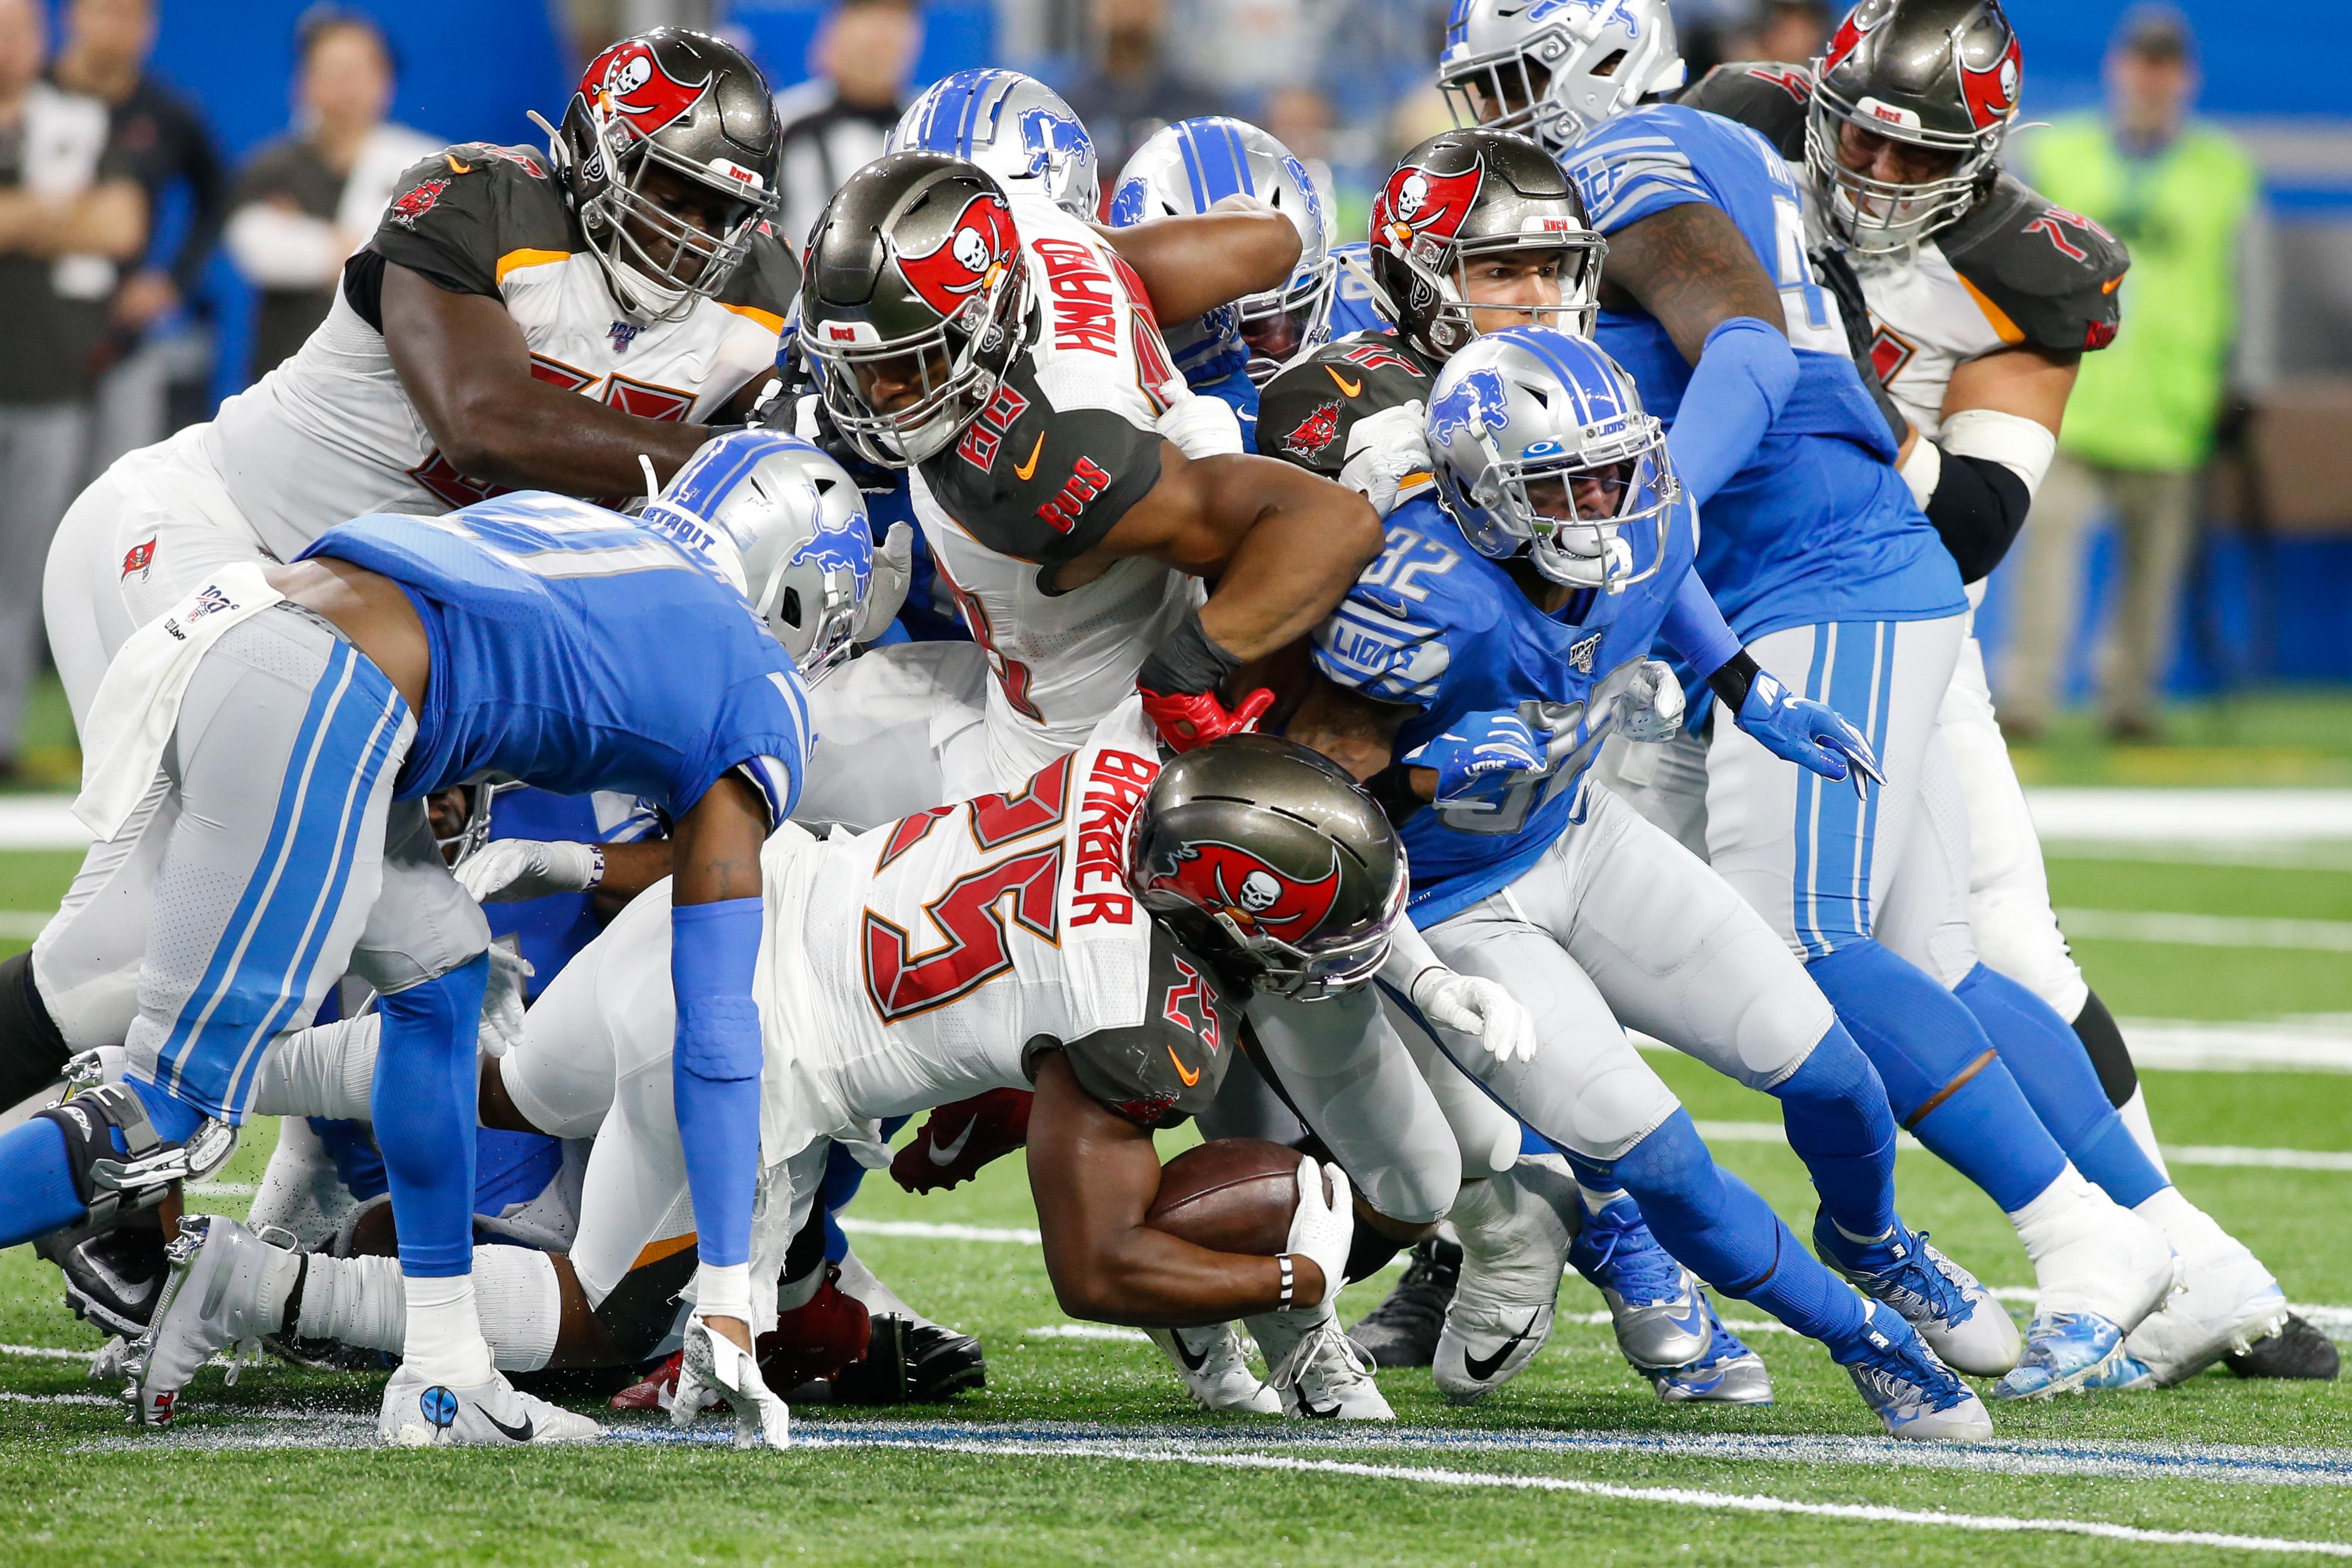 NFL: DEC 15 Buccaneers at Lions